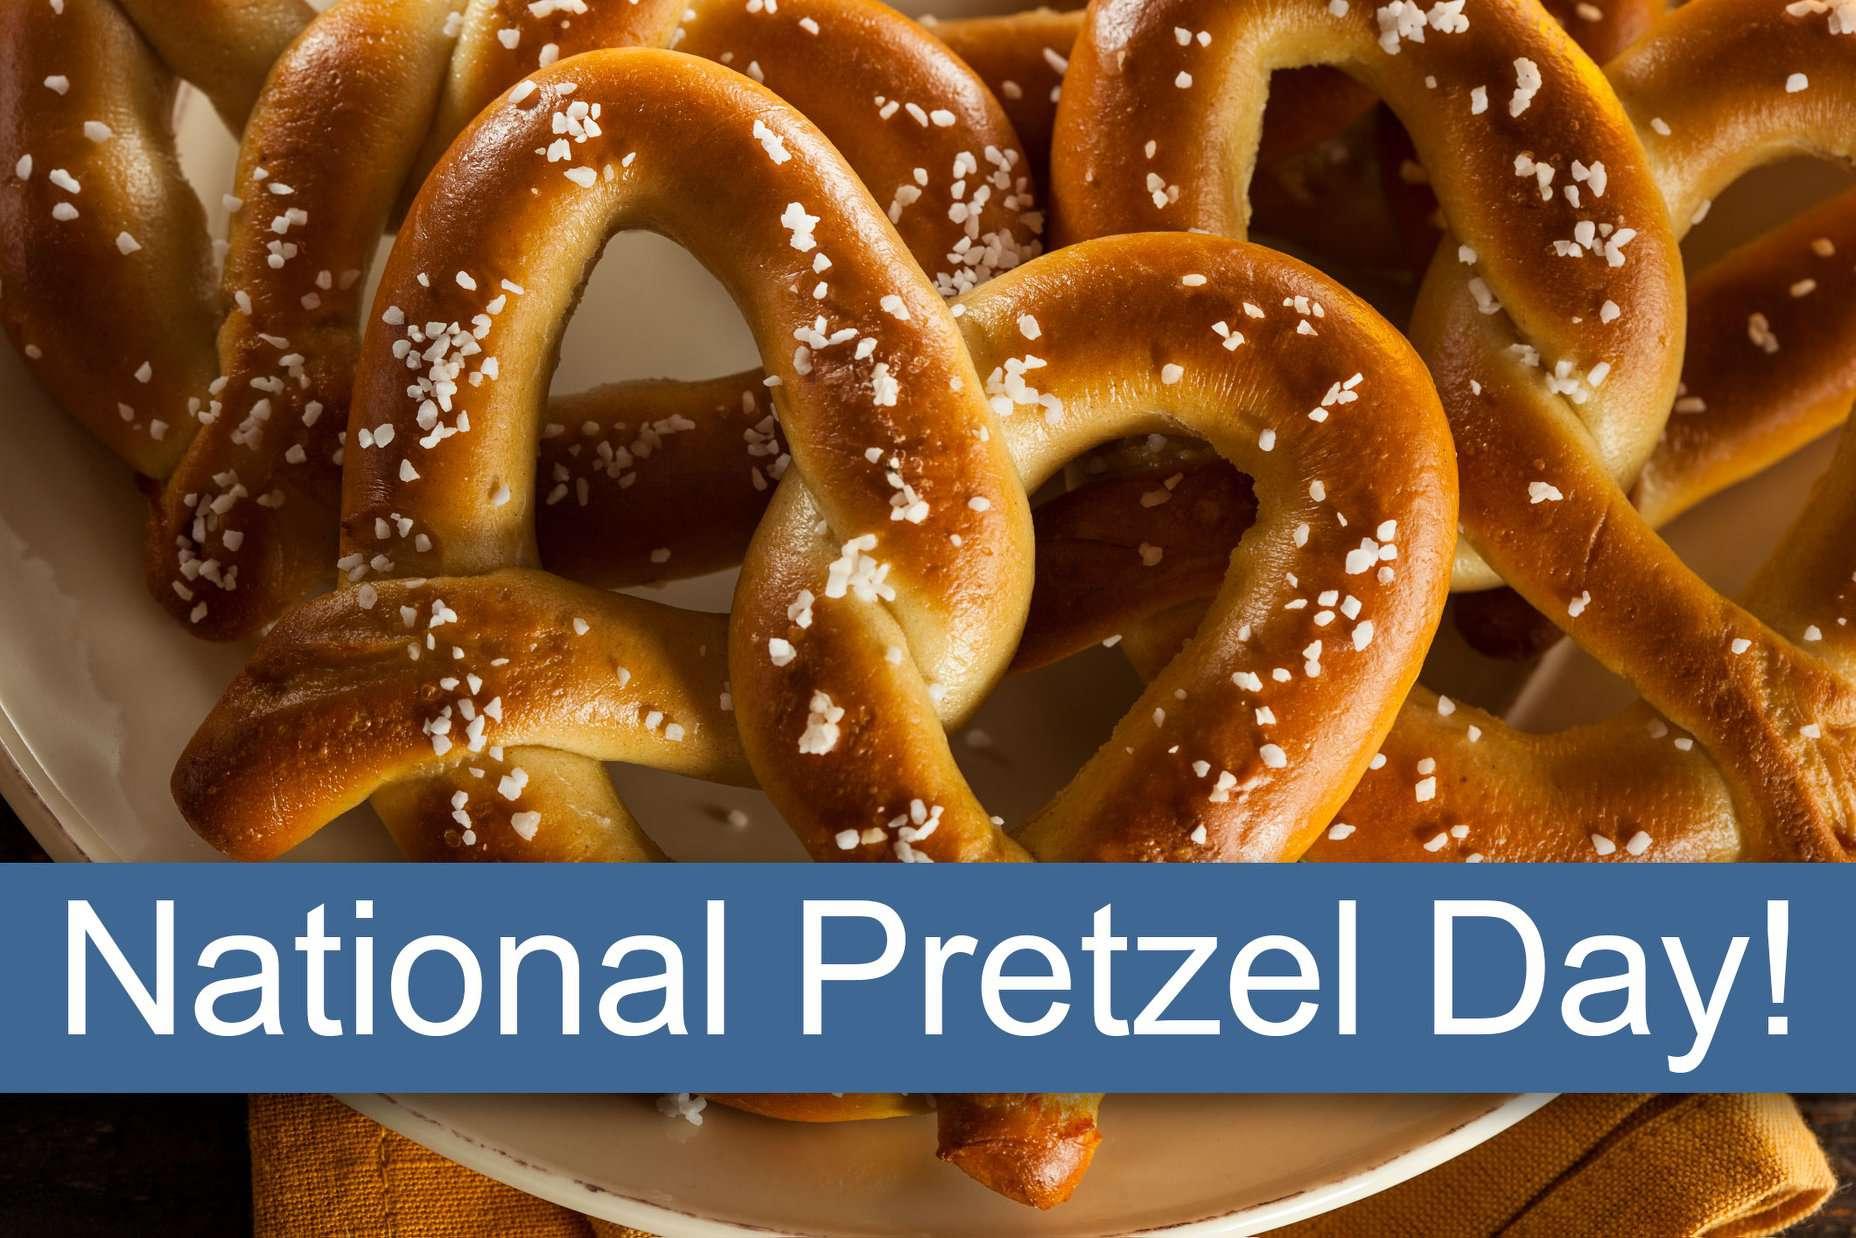 National Pretzel Day Wishes Pics